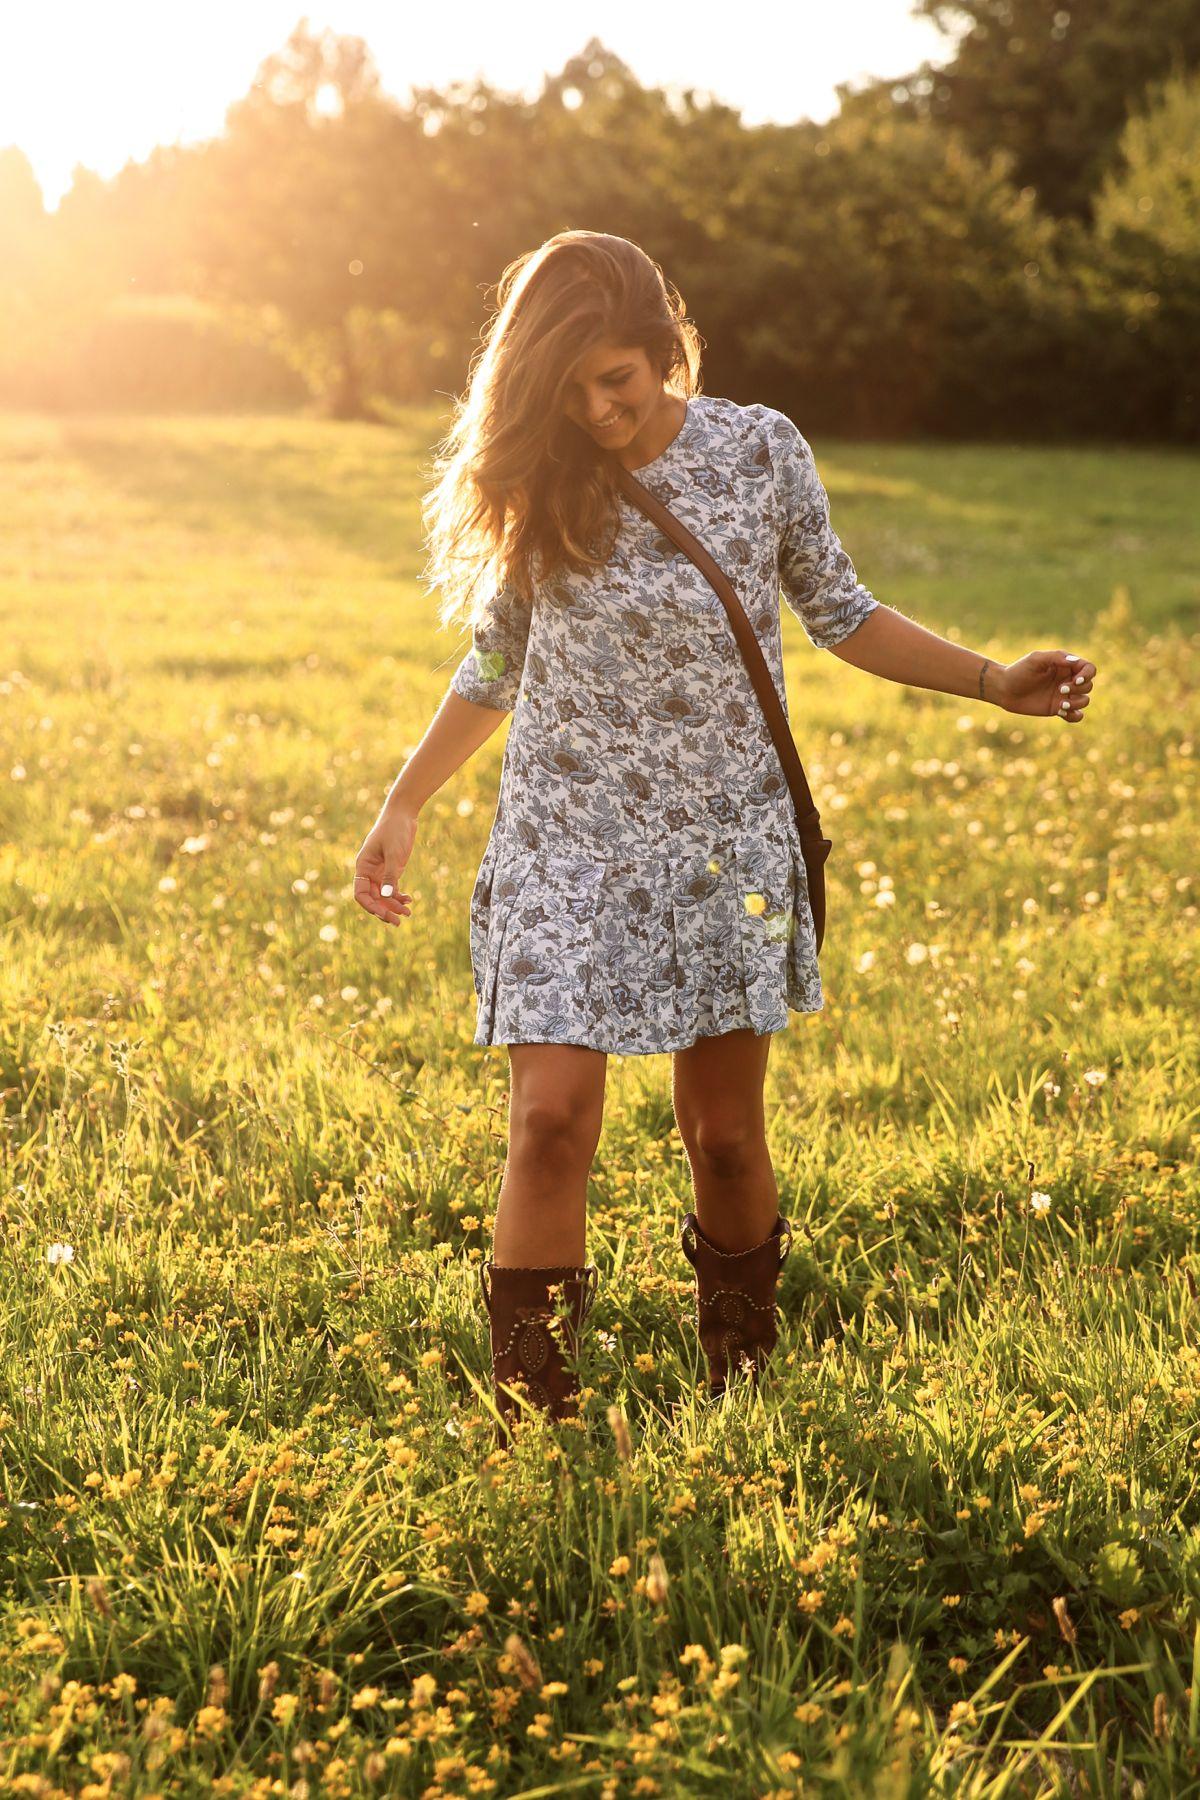 trendy_taste-look-outfit-street_style-ootd-blog-blogger-fashion_spain-moda_españa-cowboy-campero-sendra-cowboy_boots-botas_camperas-loewe-bag-bolso-vestido_flores-flower_print-dress-14